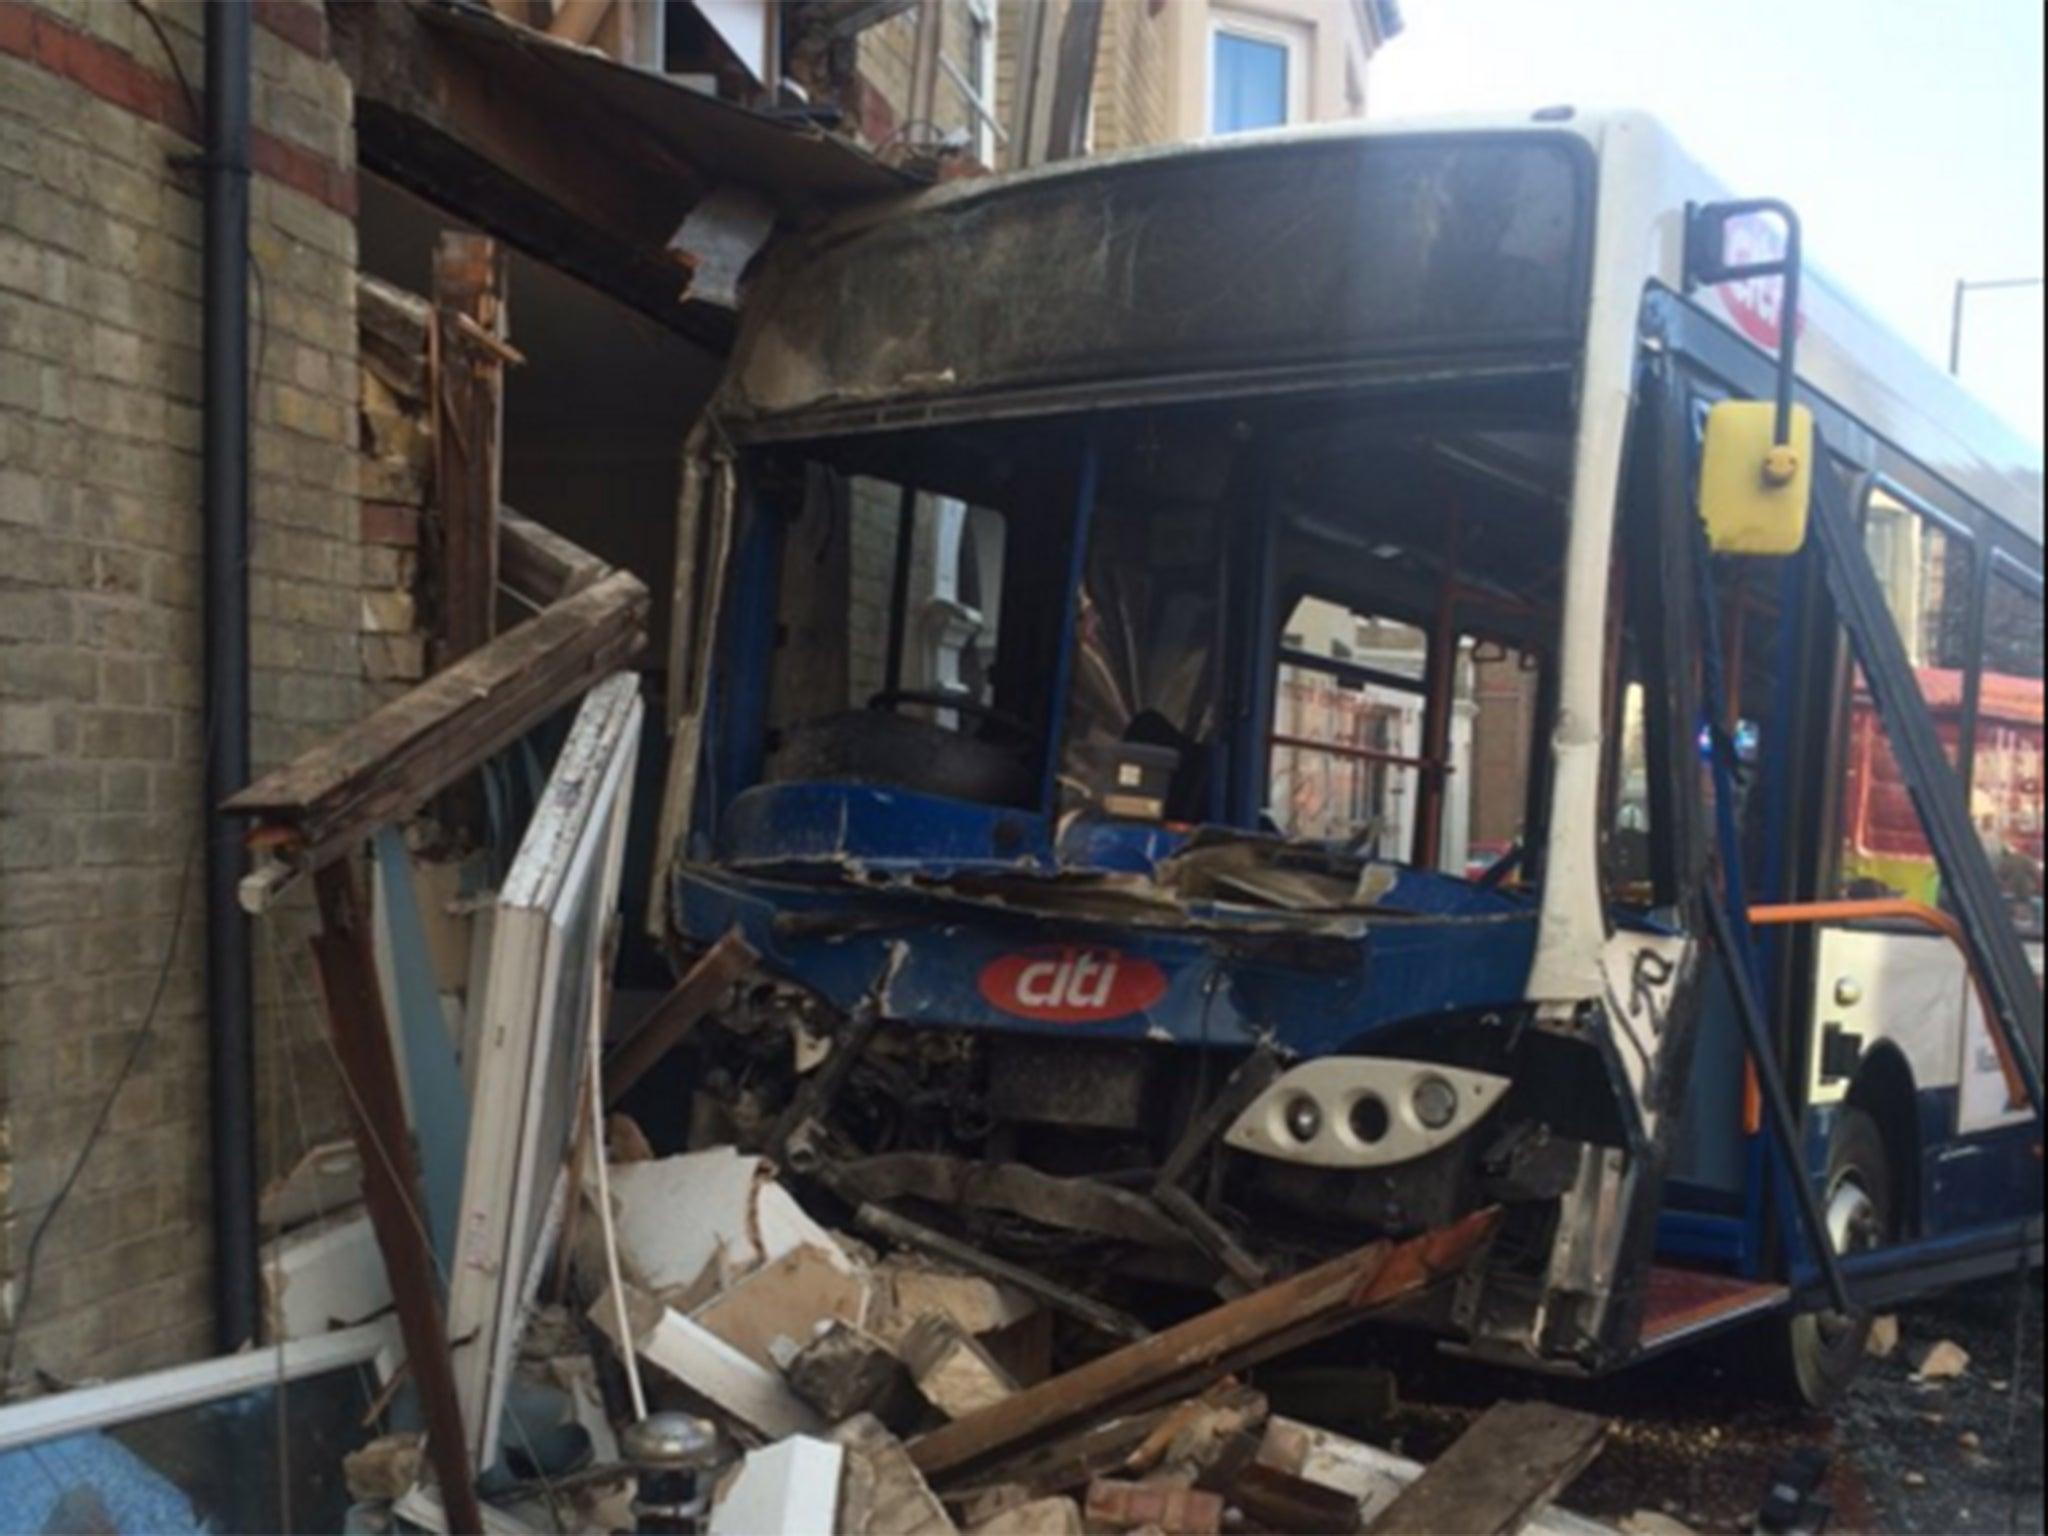 peterborough bus crash 13 injured as single decker. Black Bedroom Furniture Sets. Home Design Ideas